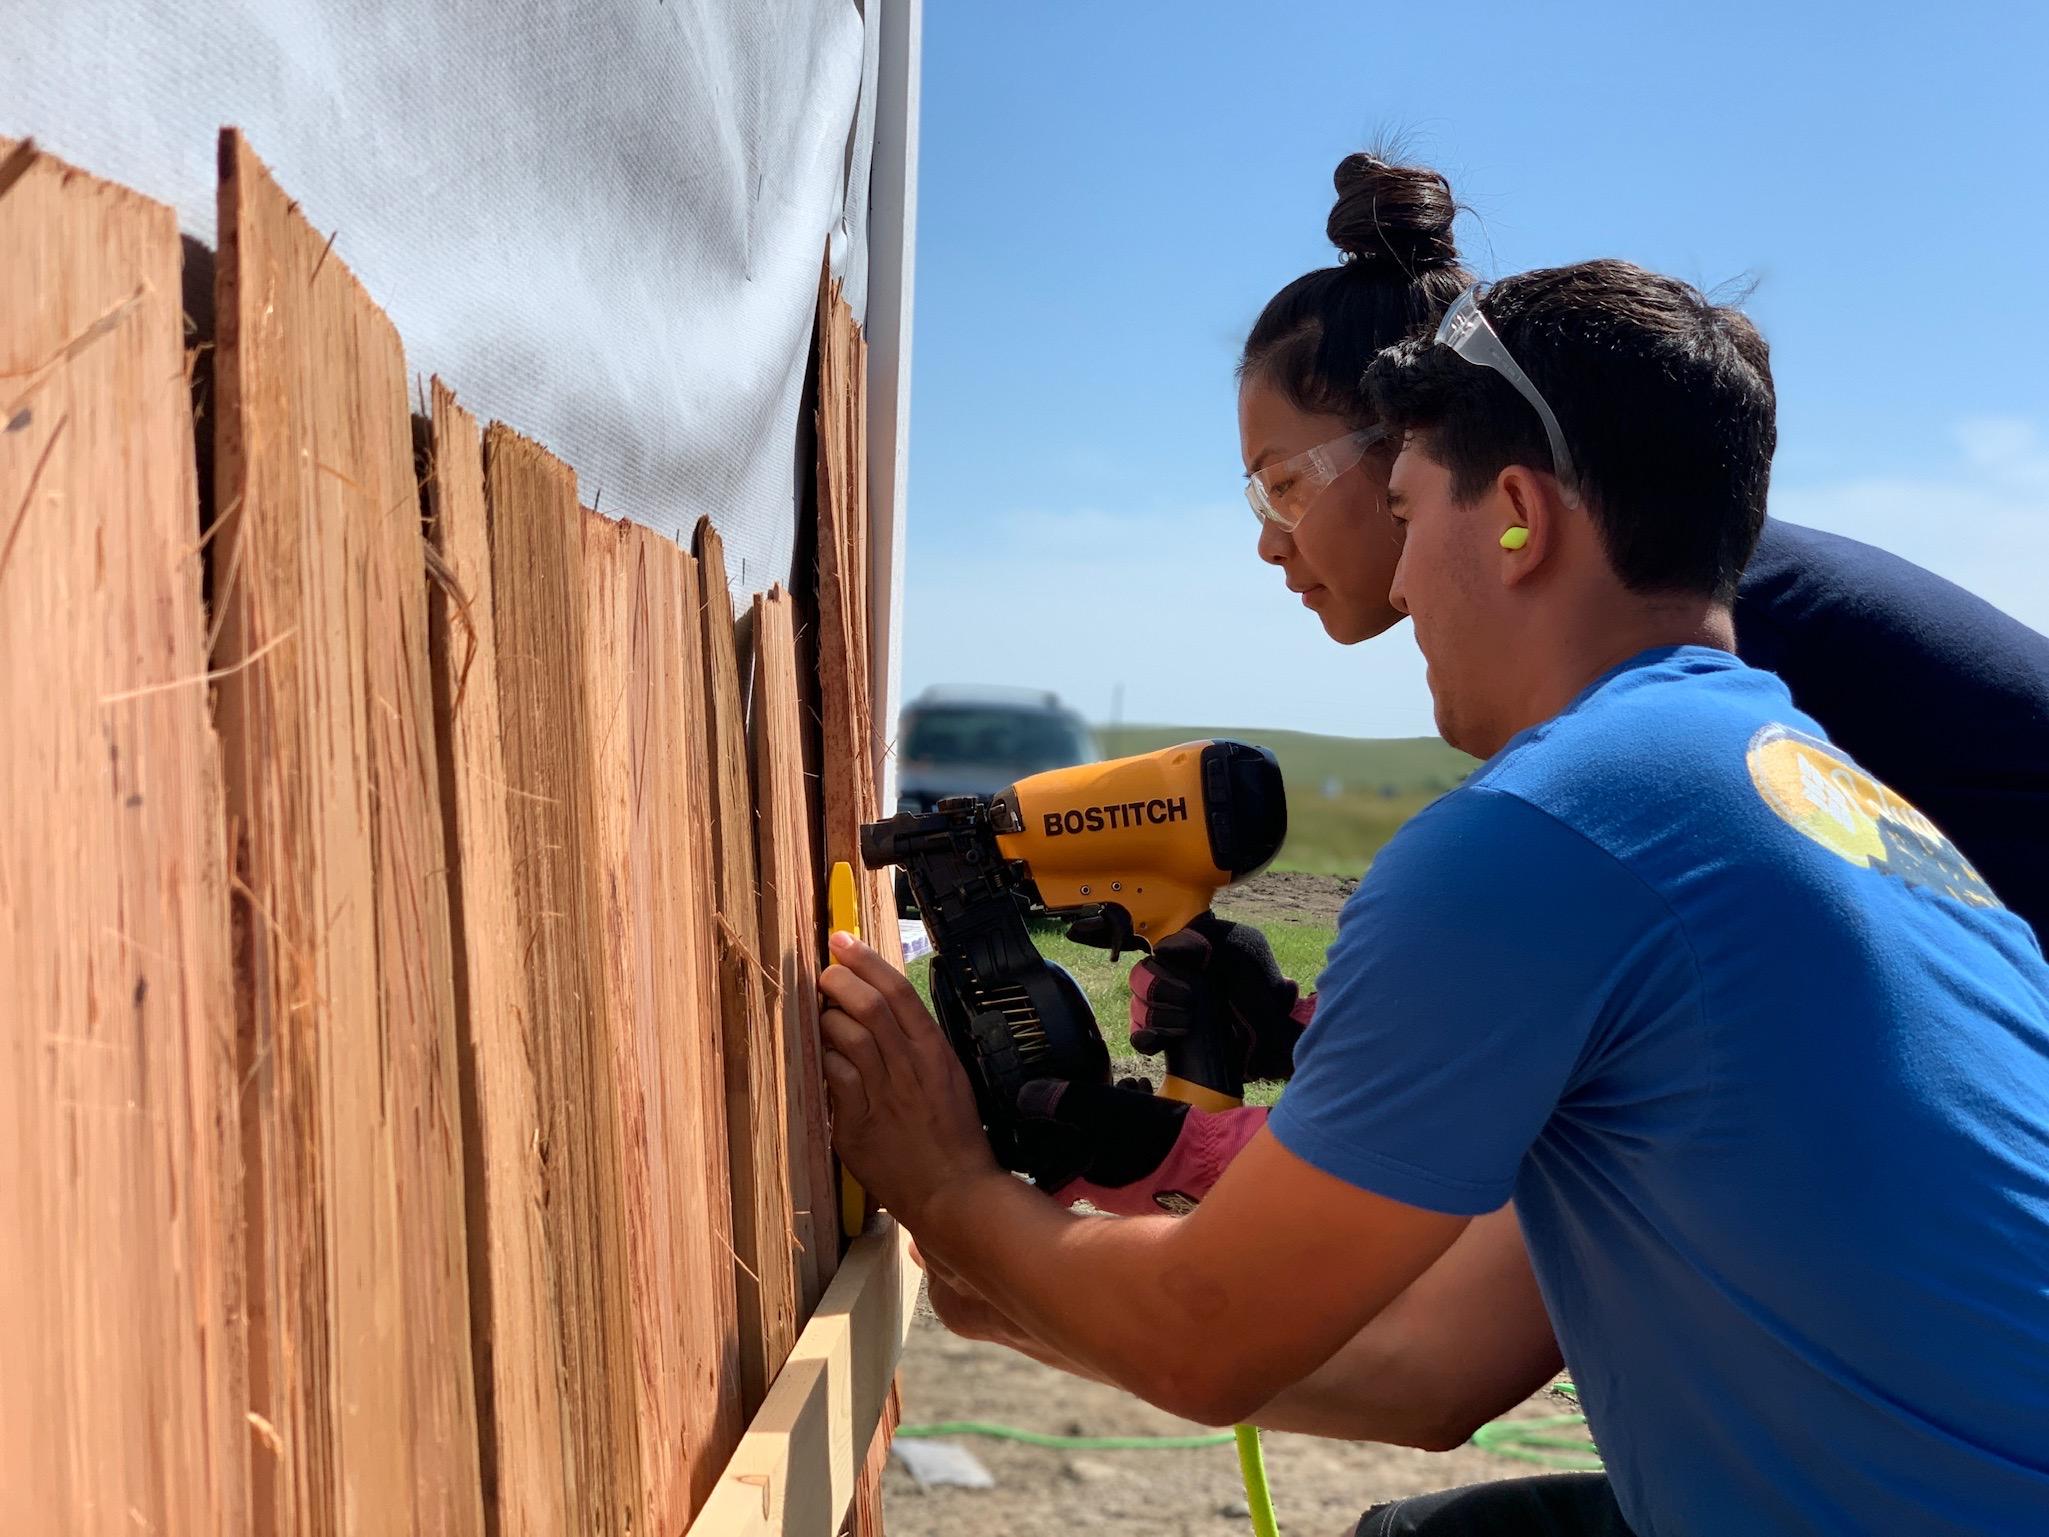 8/23/19: The University of Bridgeport volunteer team begins to install the cedar shingles.